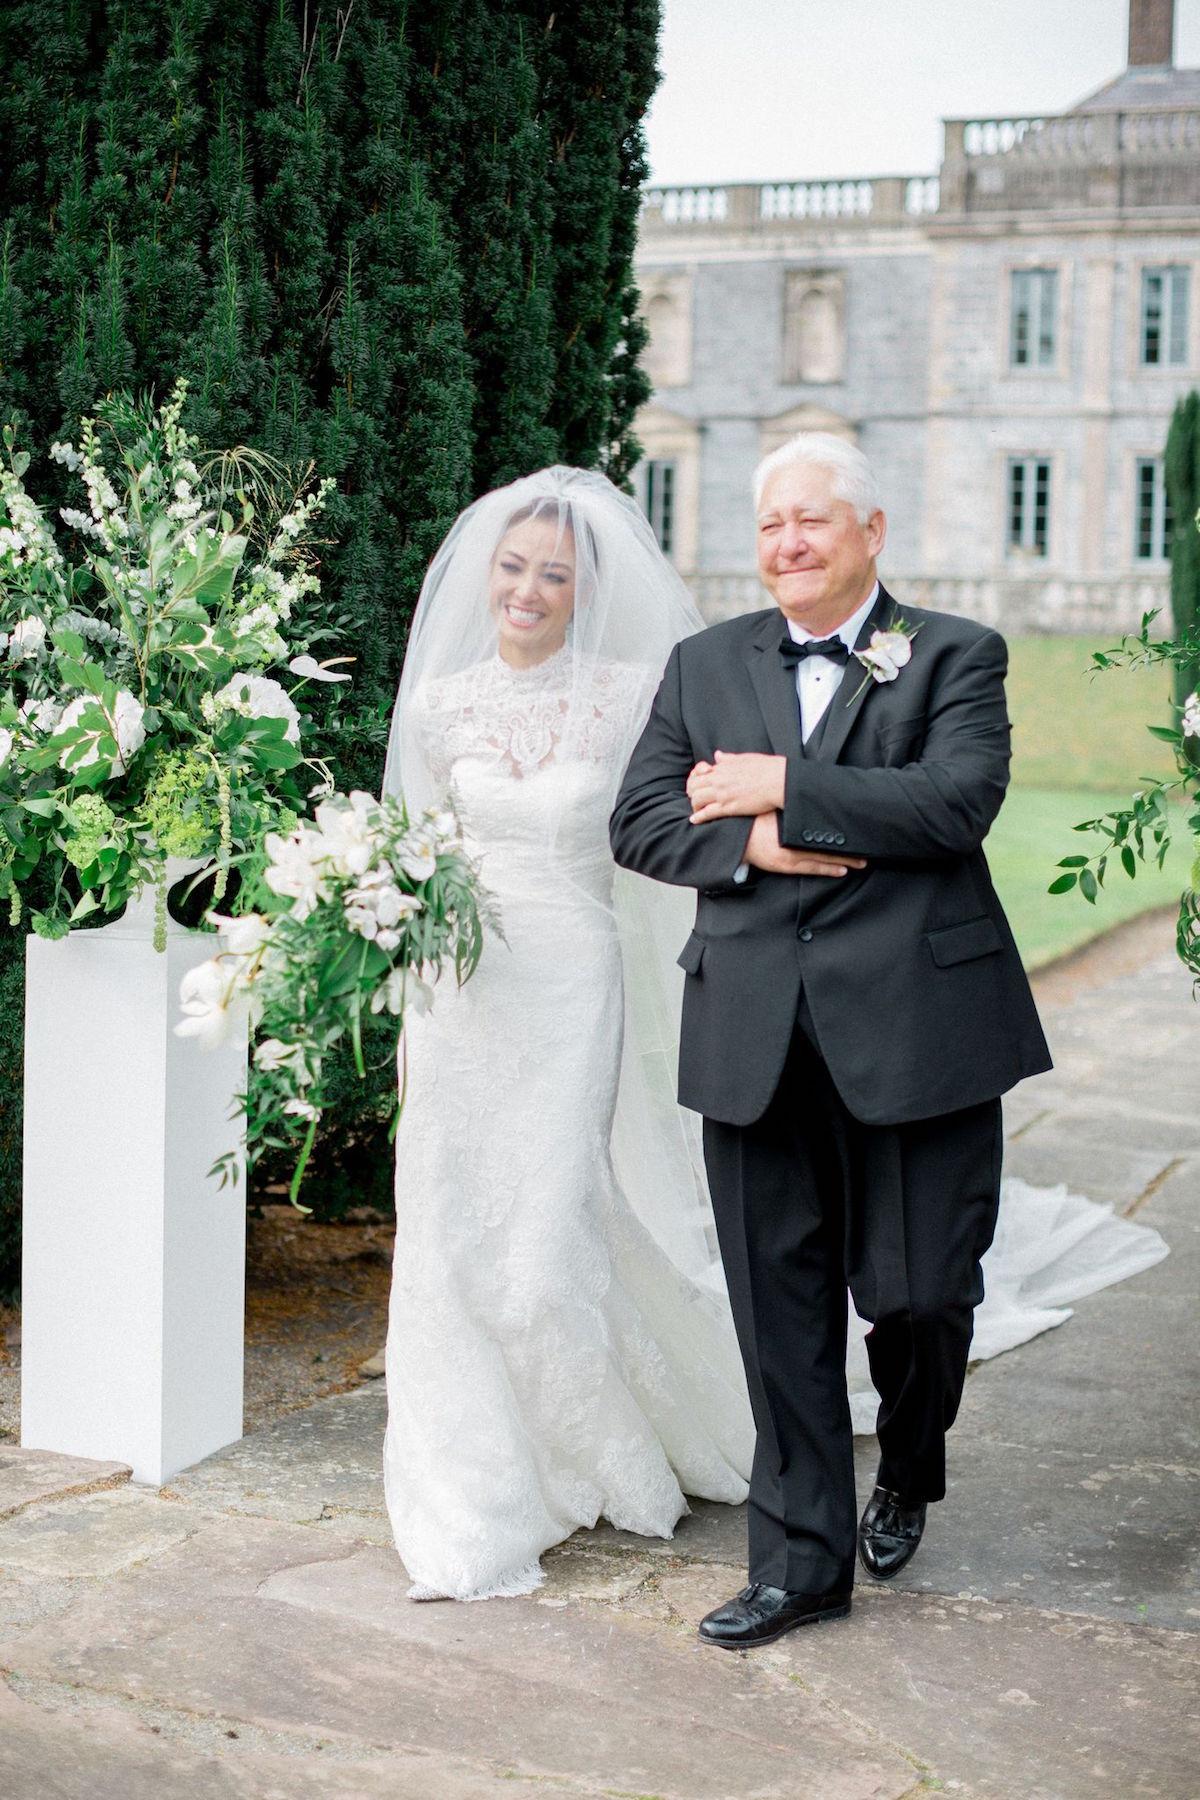 Gloster House garden wedding ceremony bride's entrance